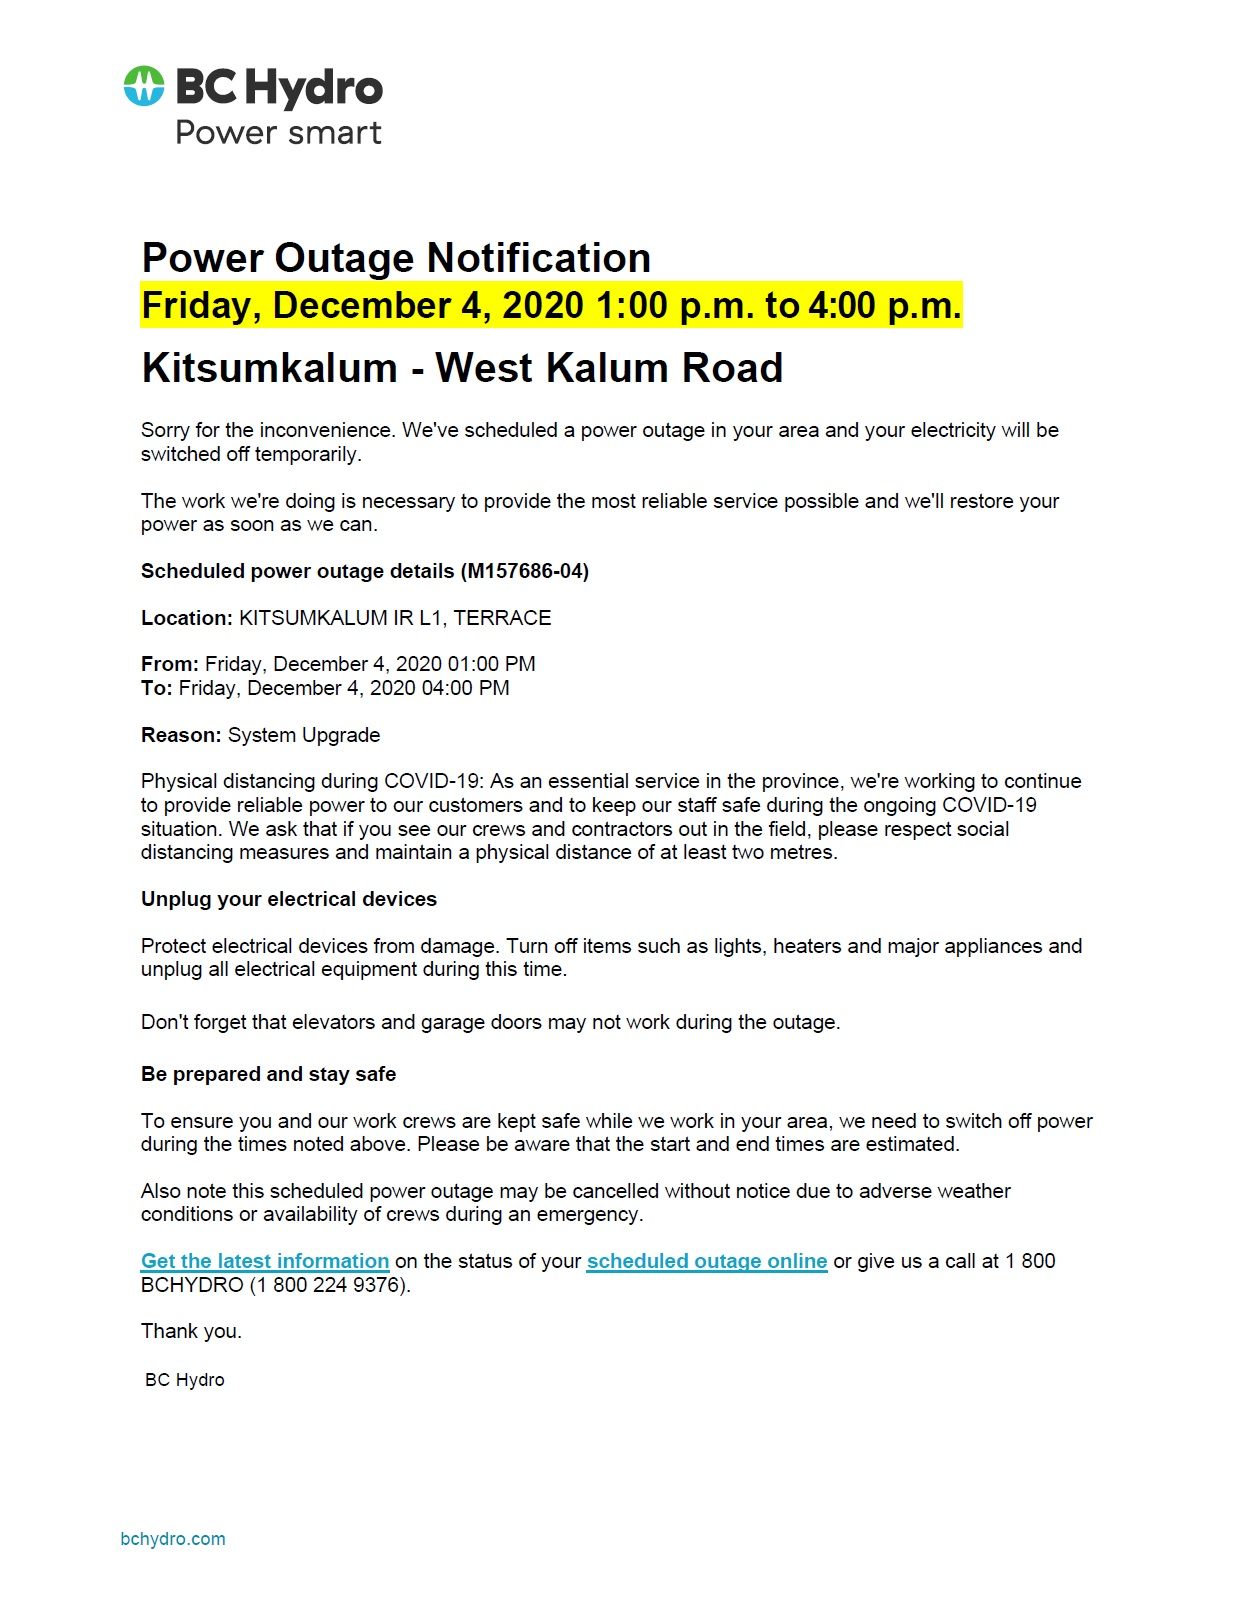 Planned Power Outage – West Kalum Road Kitsumkalum DEC 4th